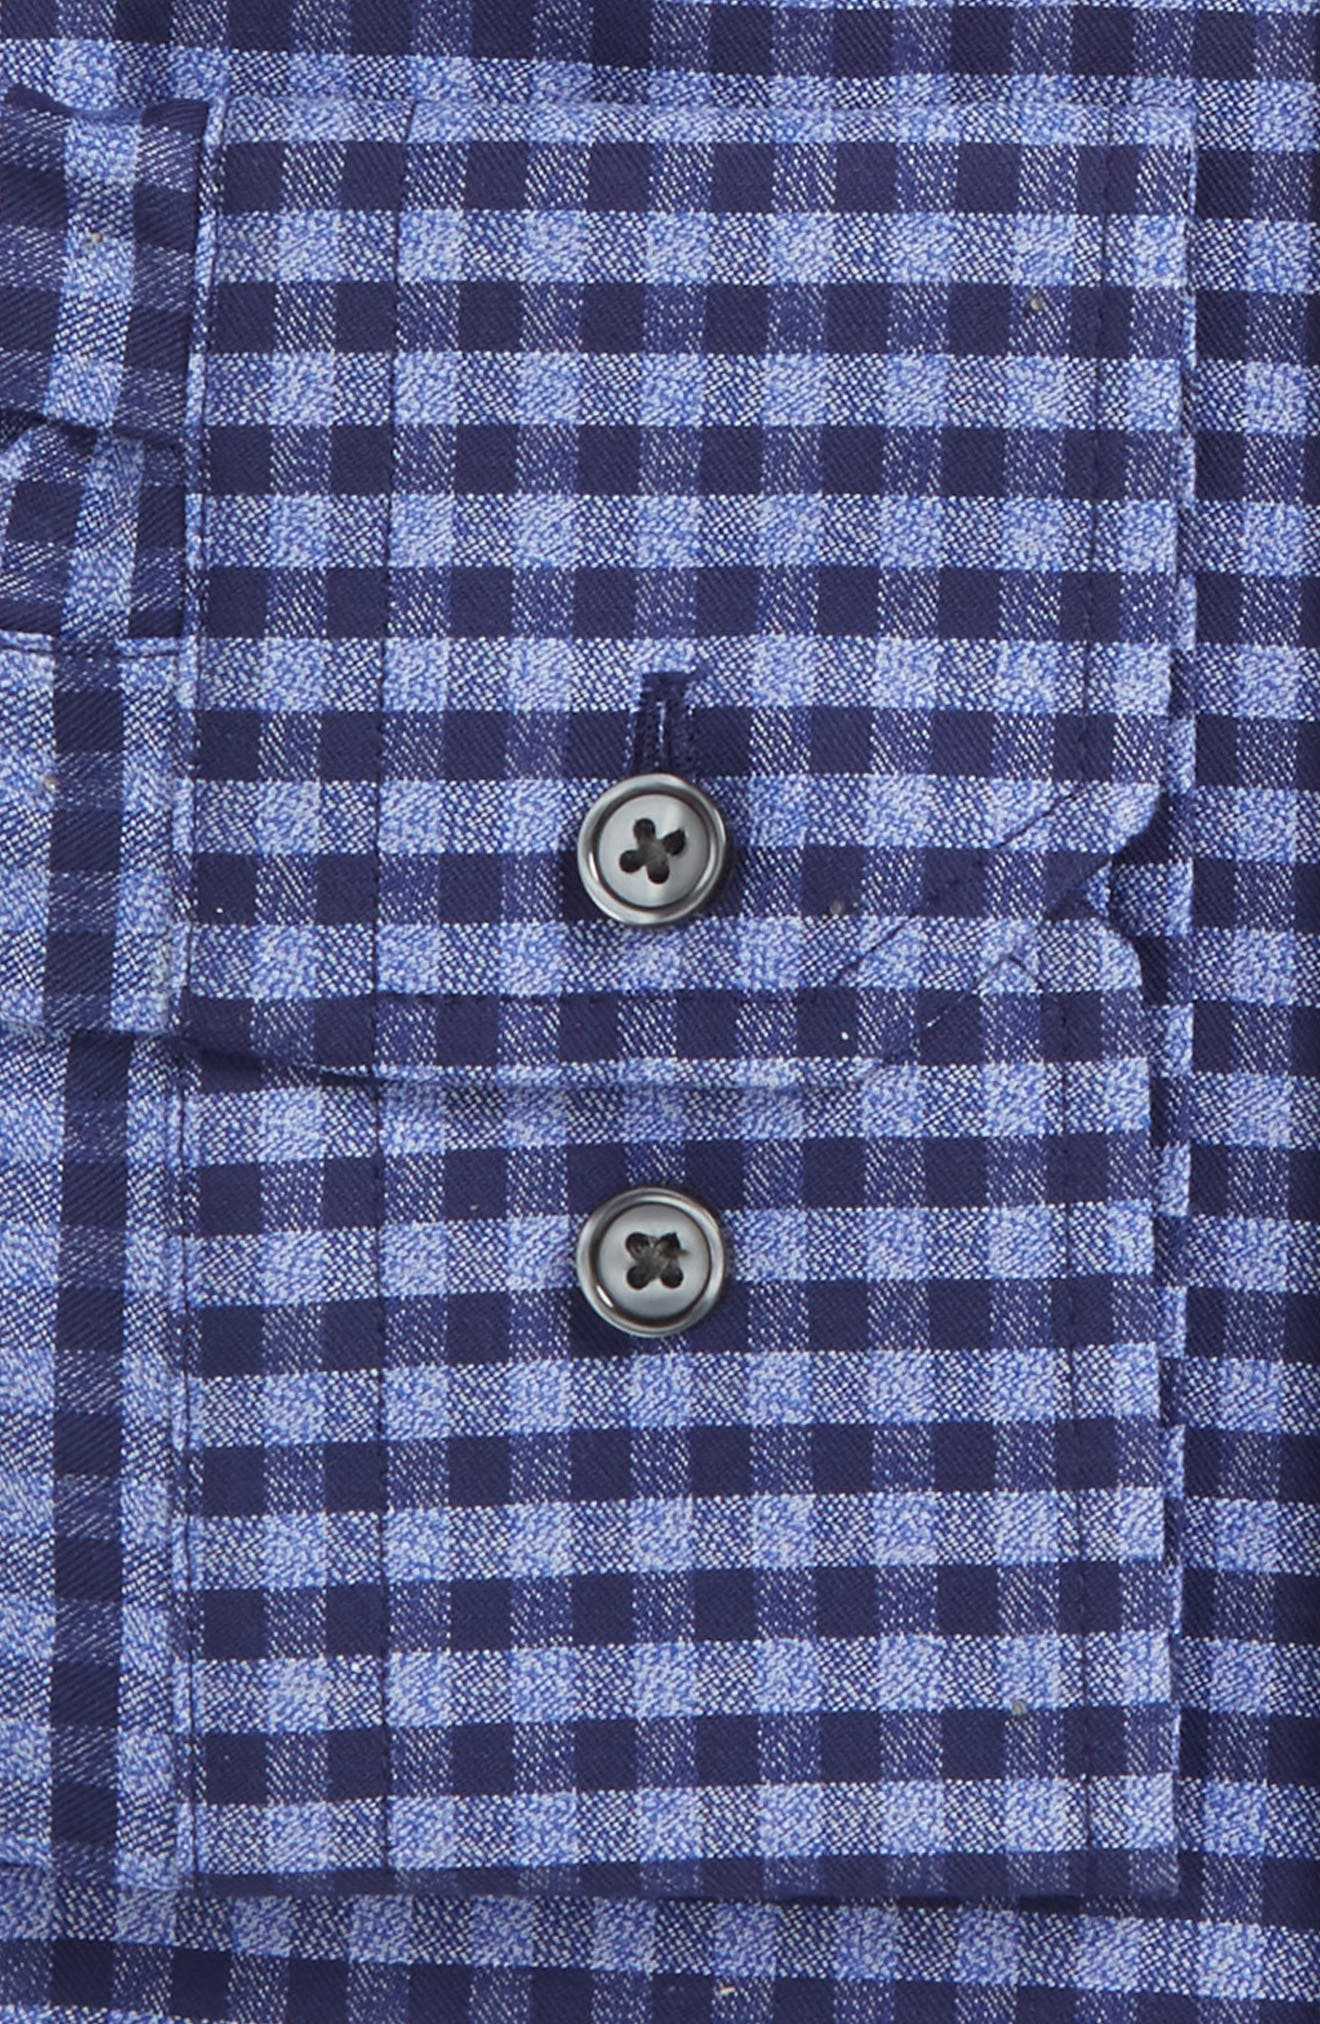 Trim Fit Non-Iron Check Dress Shirt,                             Alternate thumbnail 4, color,                             420